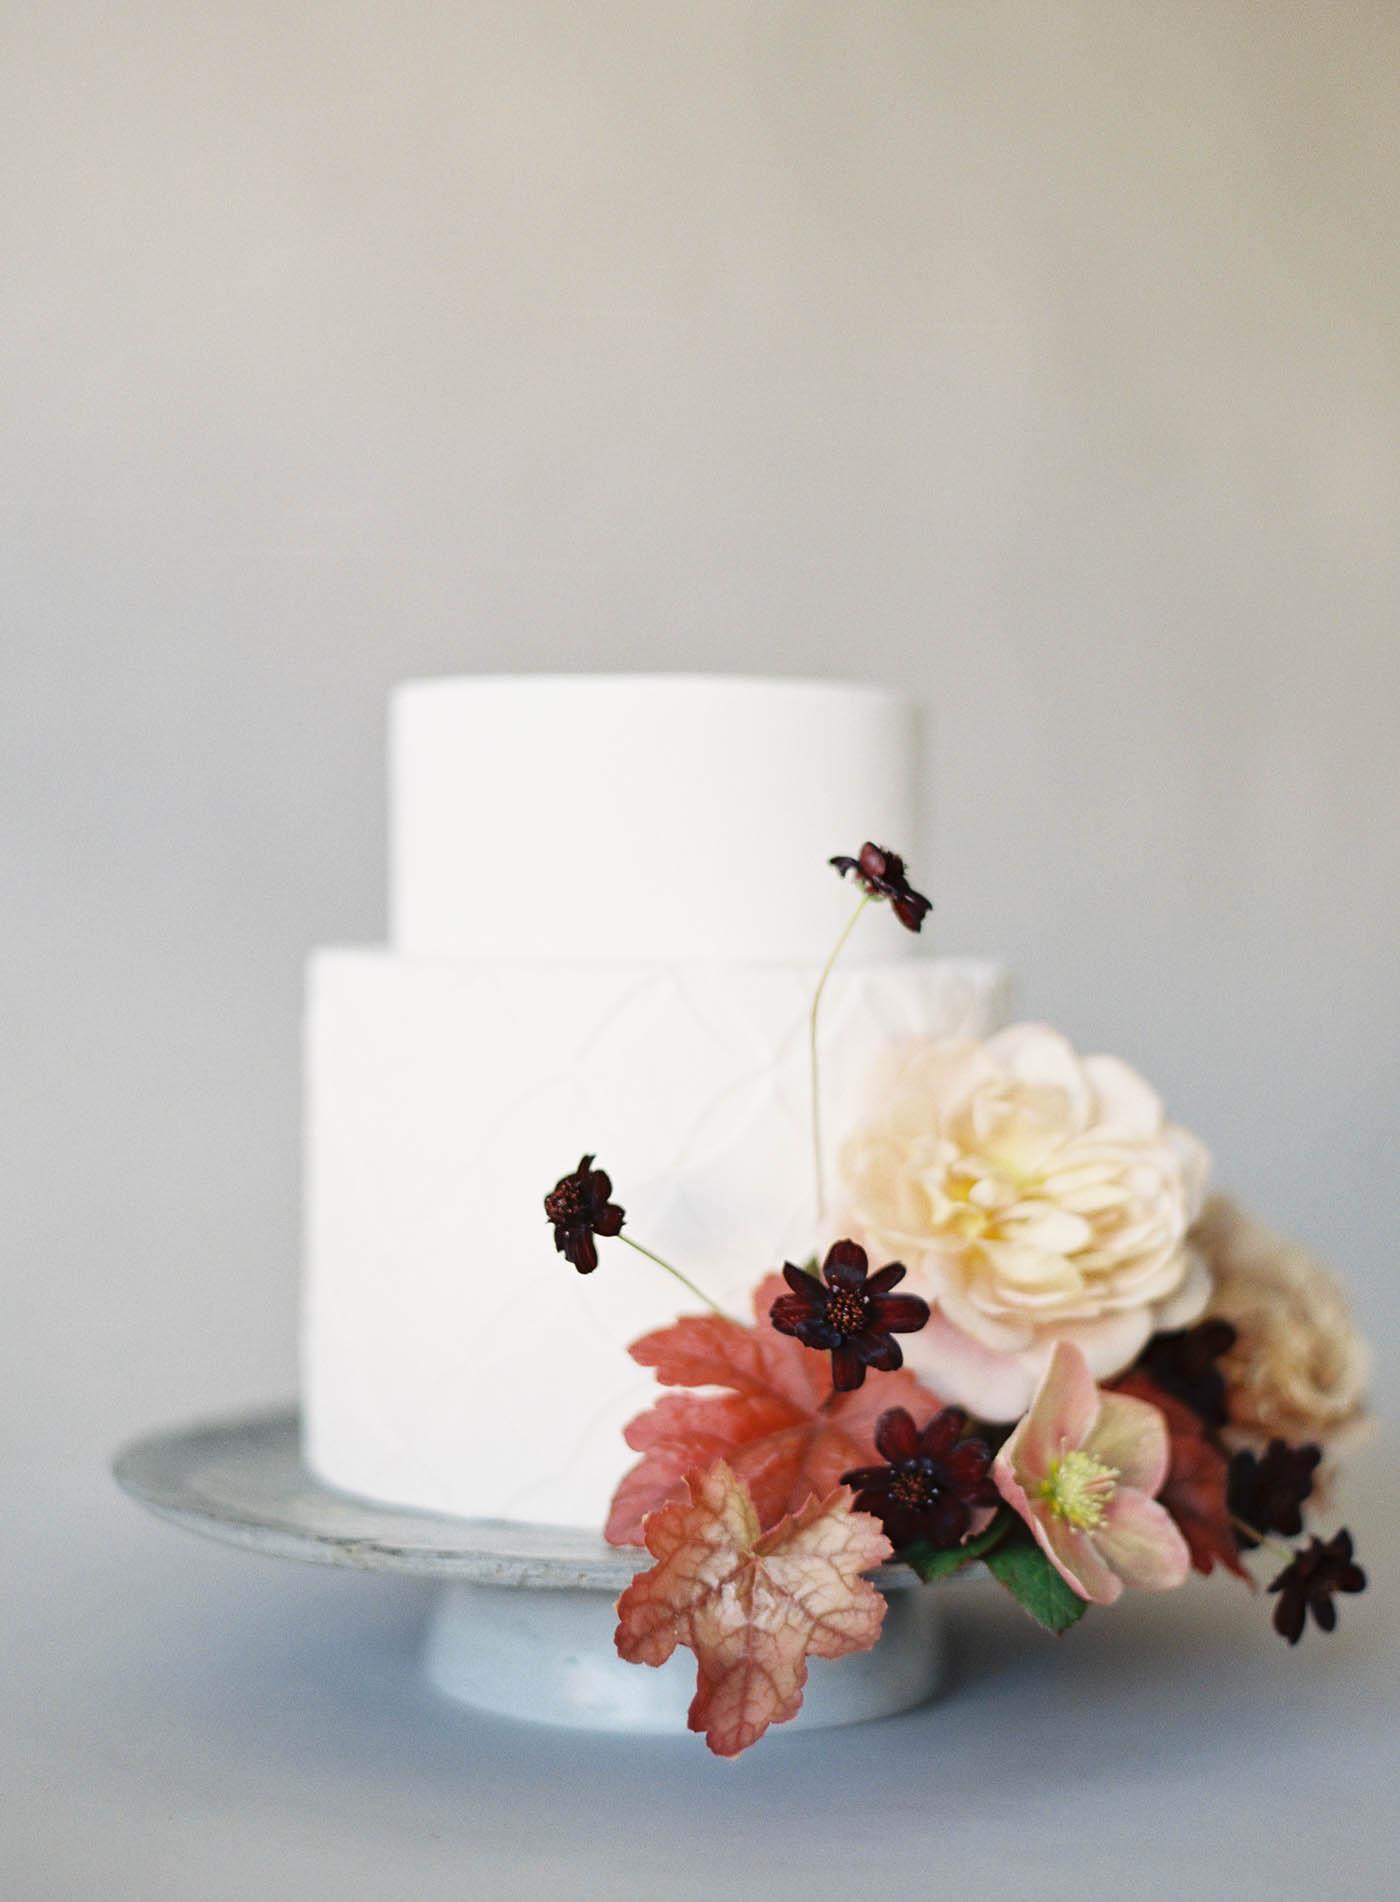 naturalist-cakes-12-Jen_Huang-000487-R1-E008.jpg